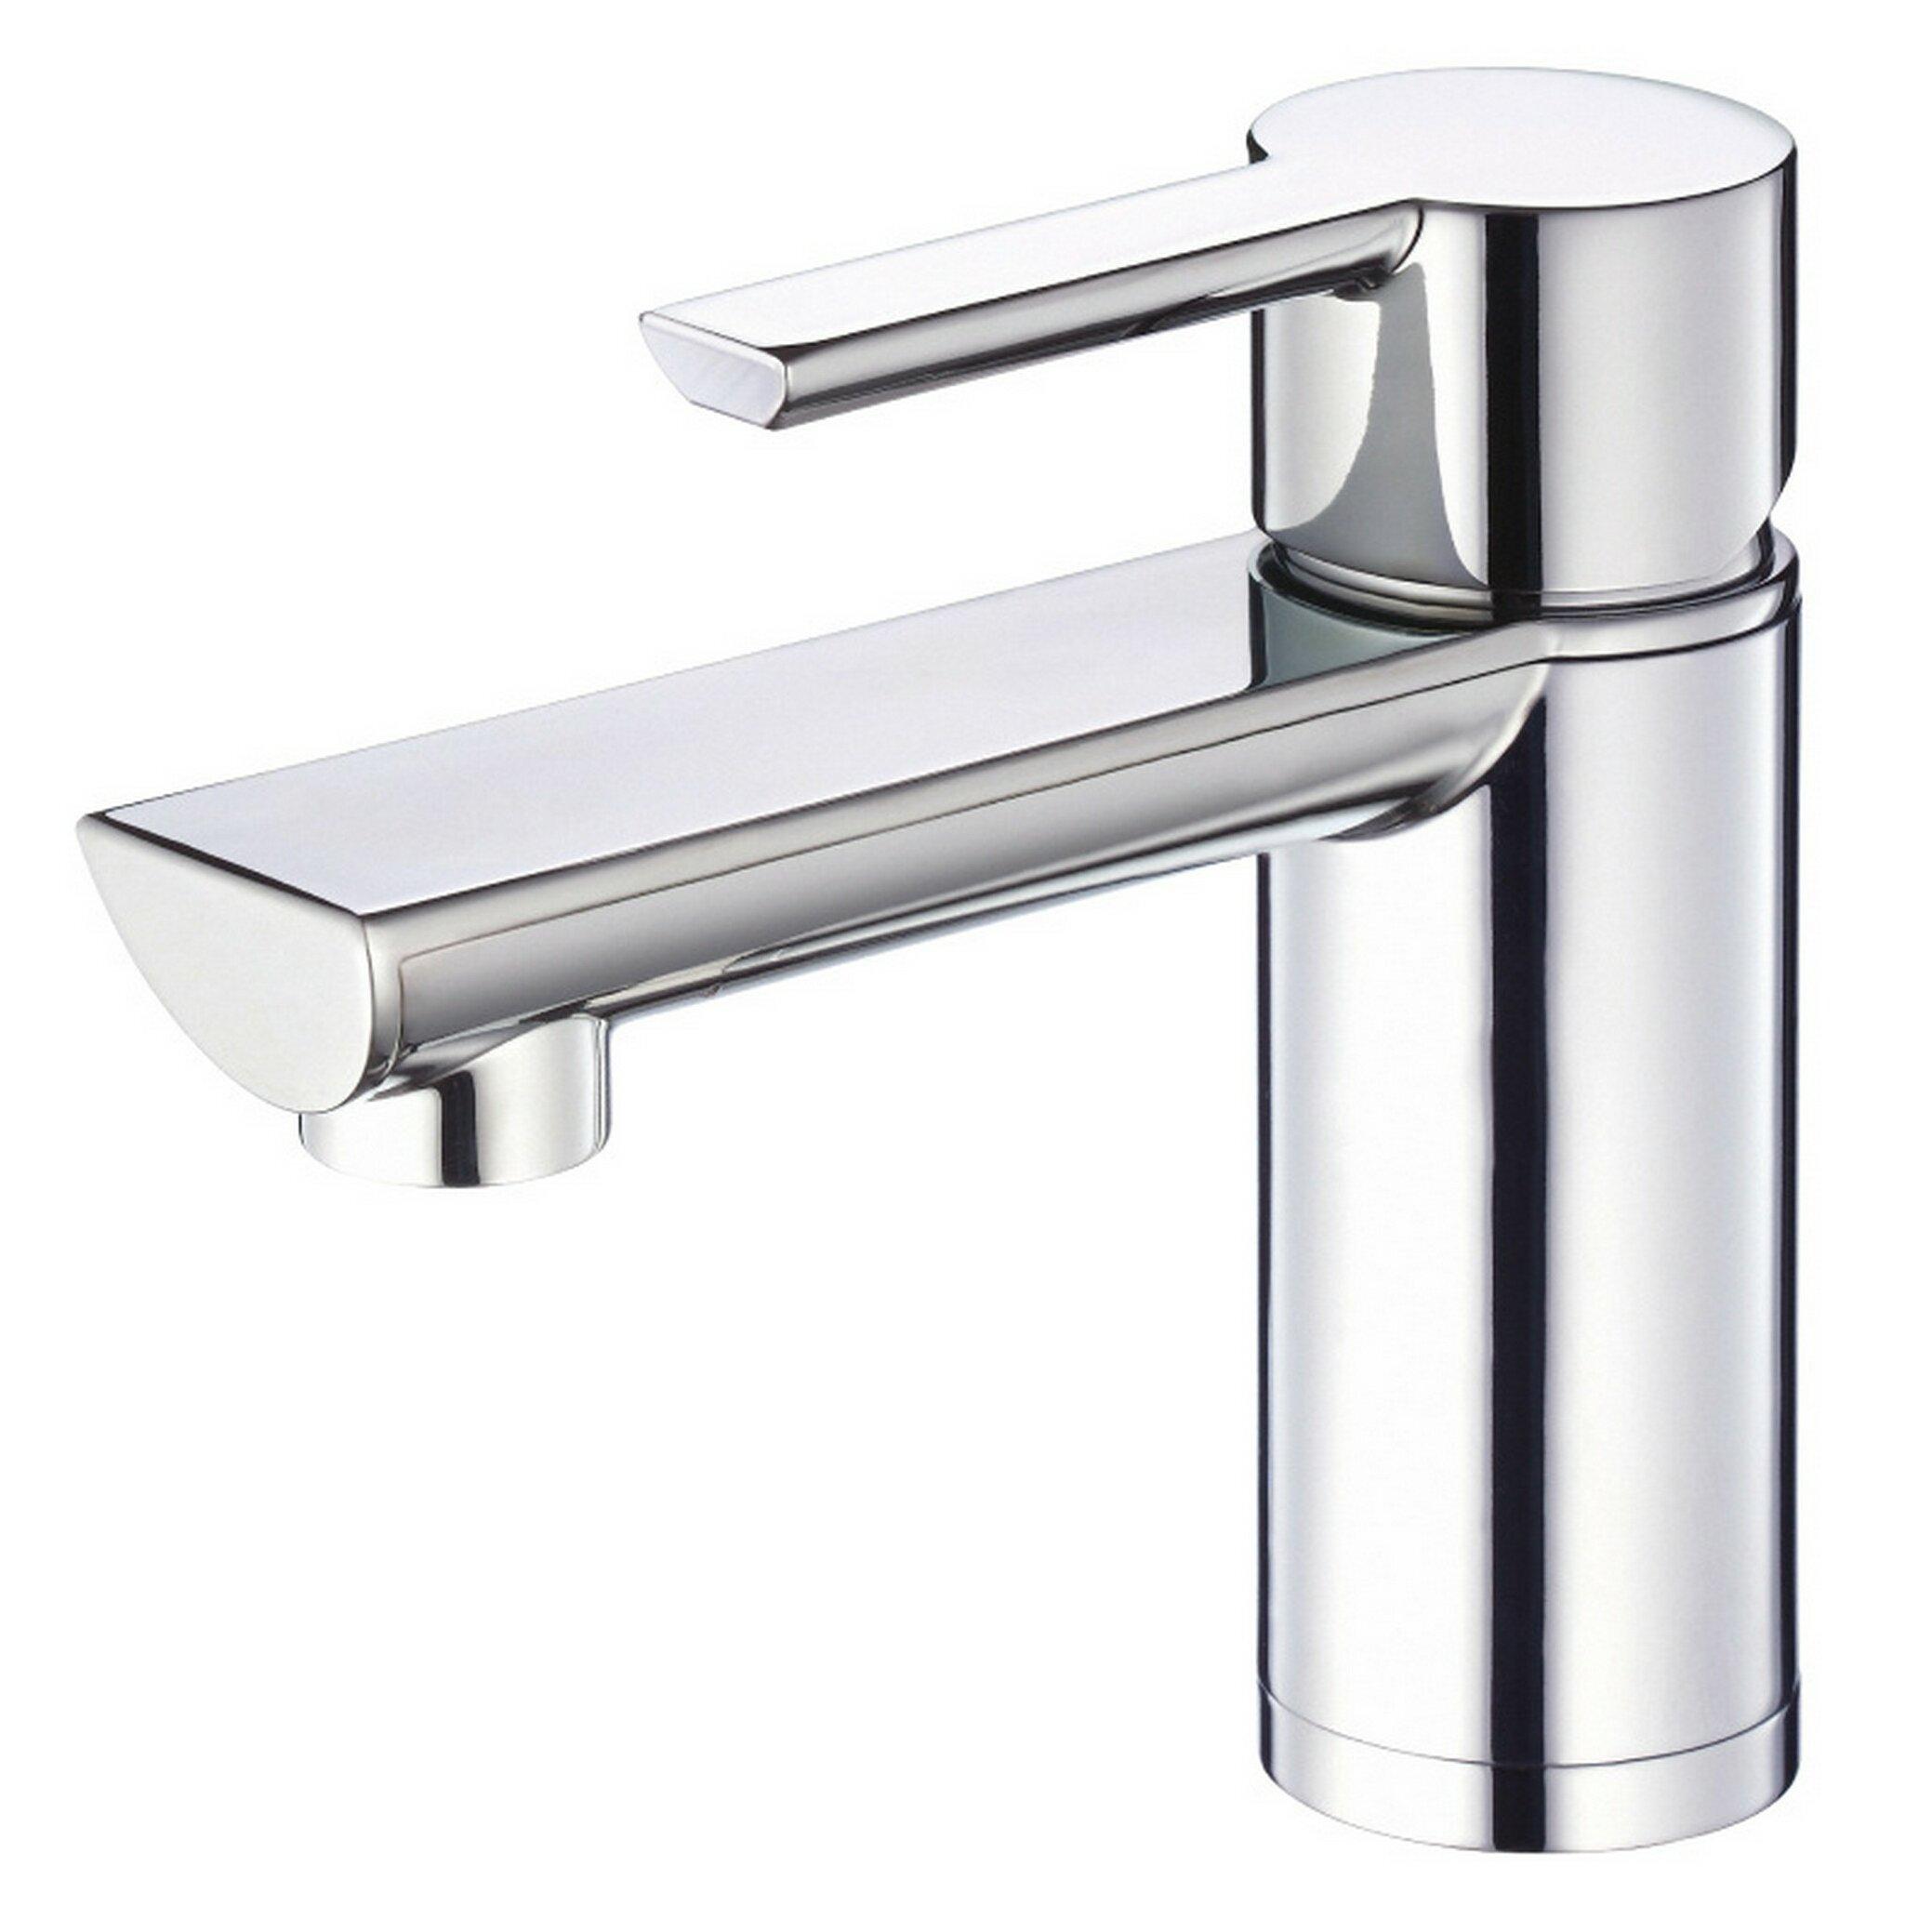 Danze adonis single handle single hole bathroom faucet reviews wayfair for Danze bathroom faucets reviews